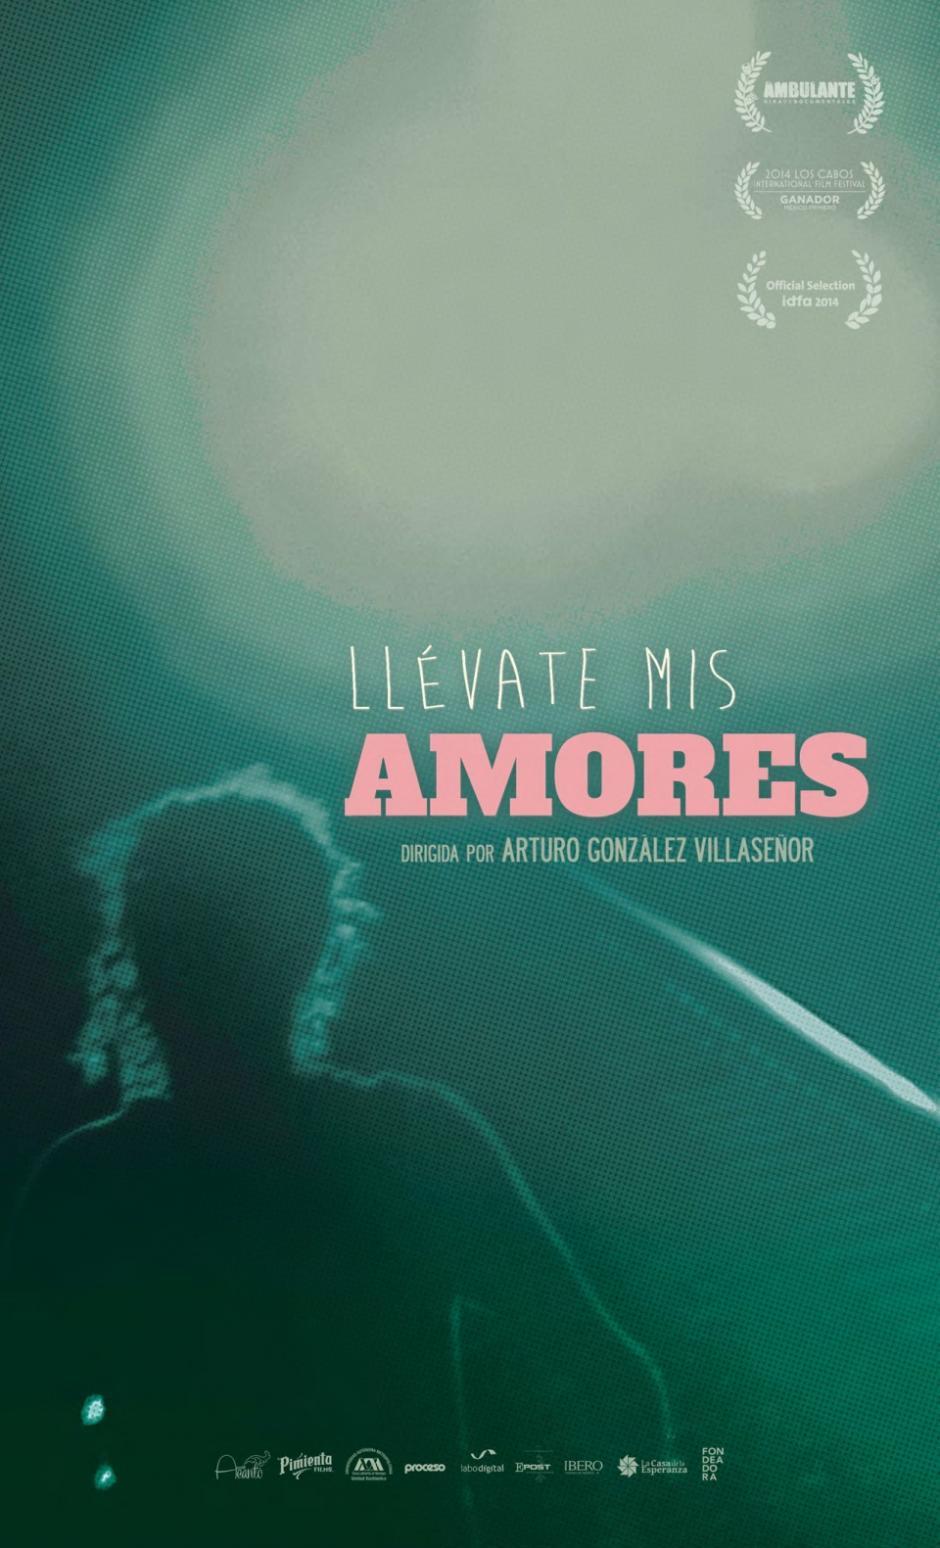 lllevate_mis_amores